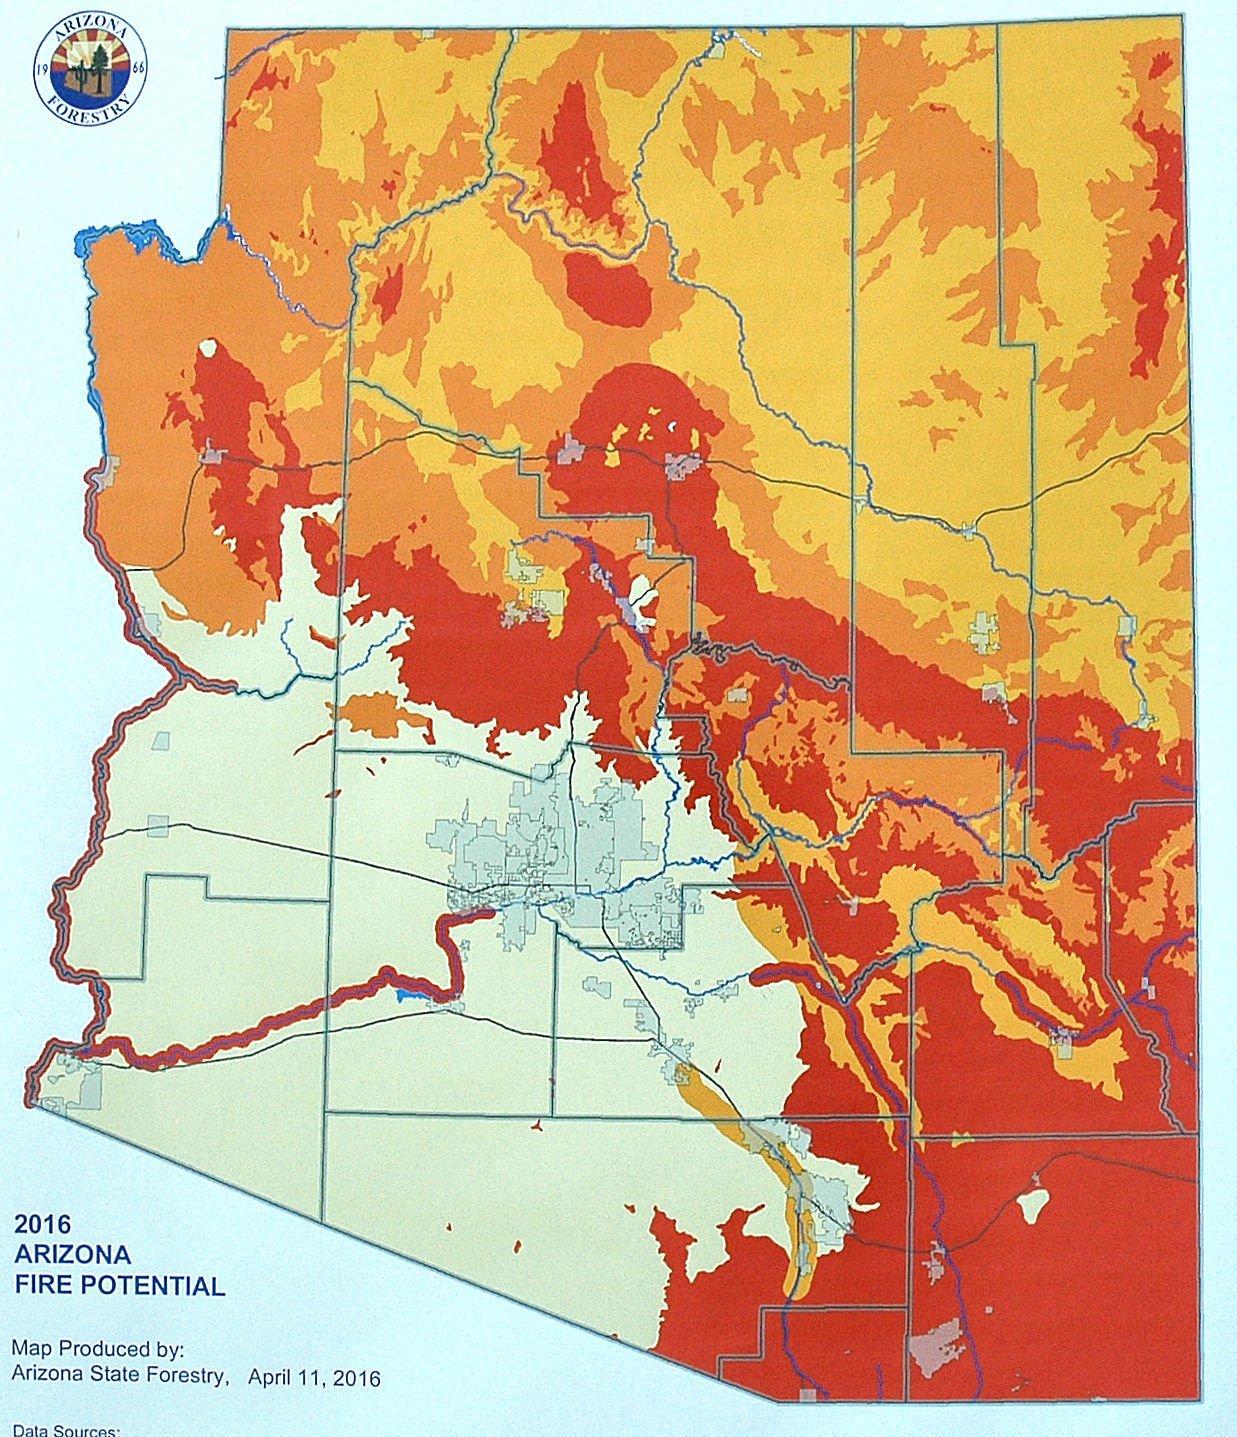 Map Of Wildfires In Arizona Arizona officials preparing for dangerous wildfire season | Local